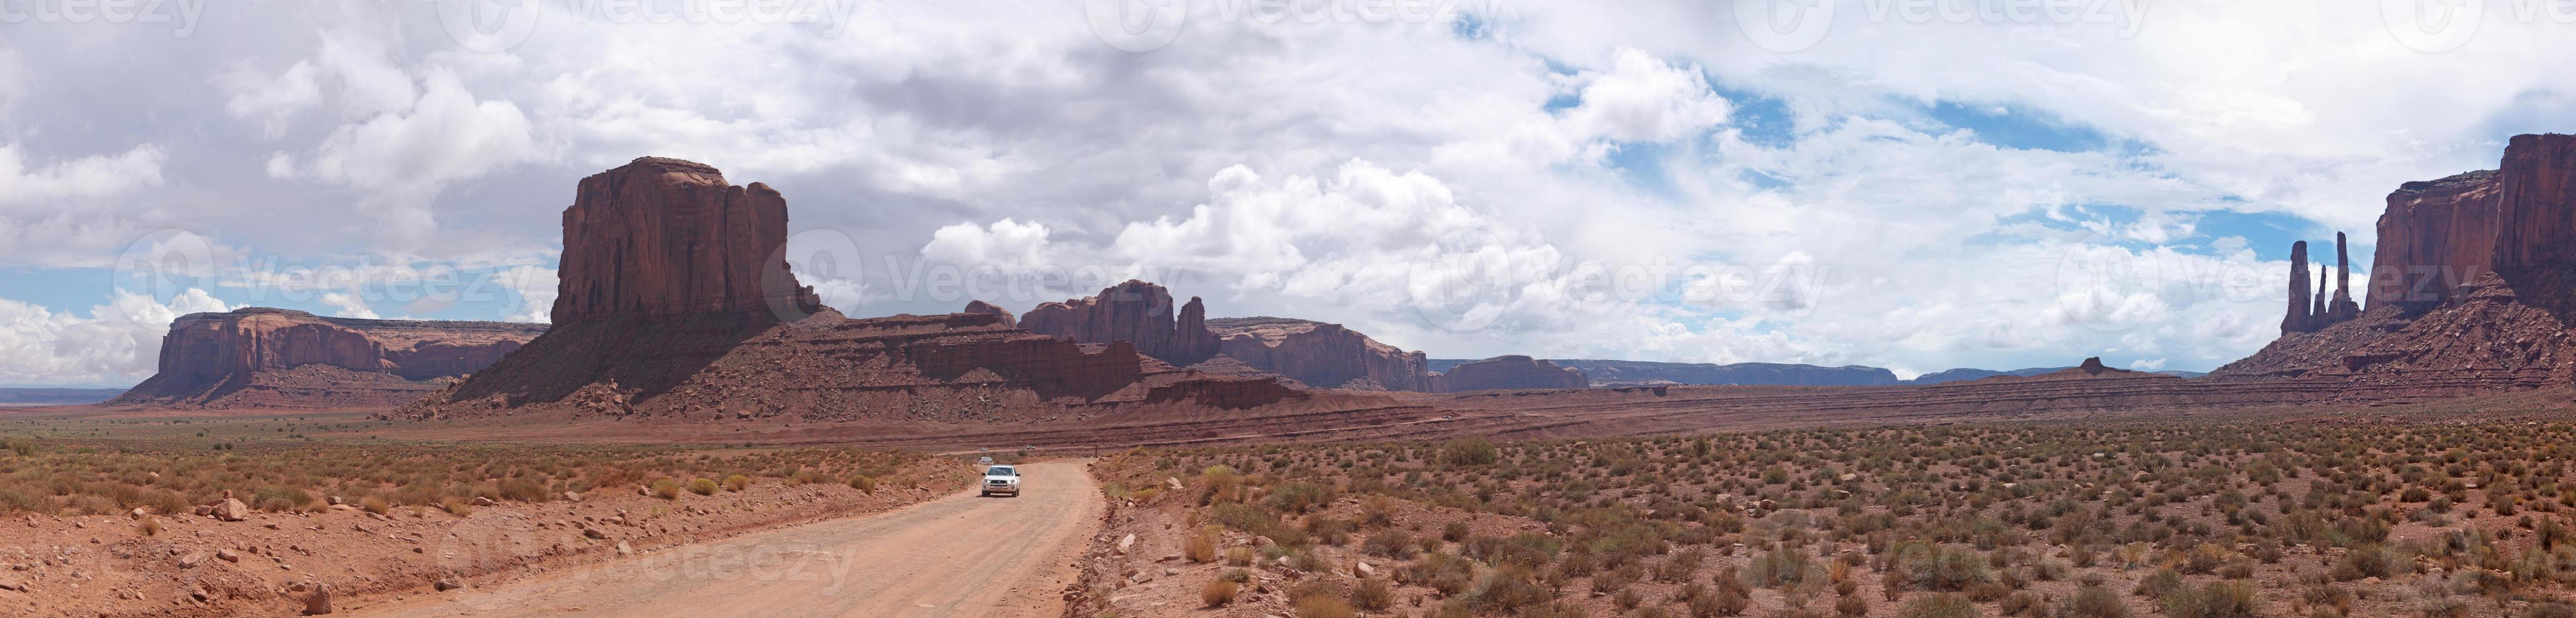 Monument Valley panorama photo